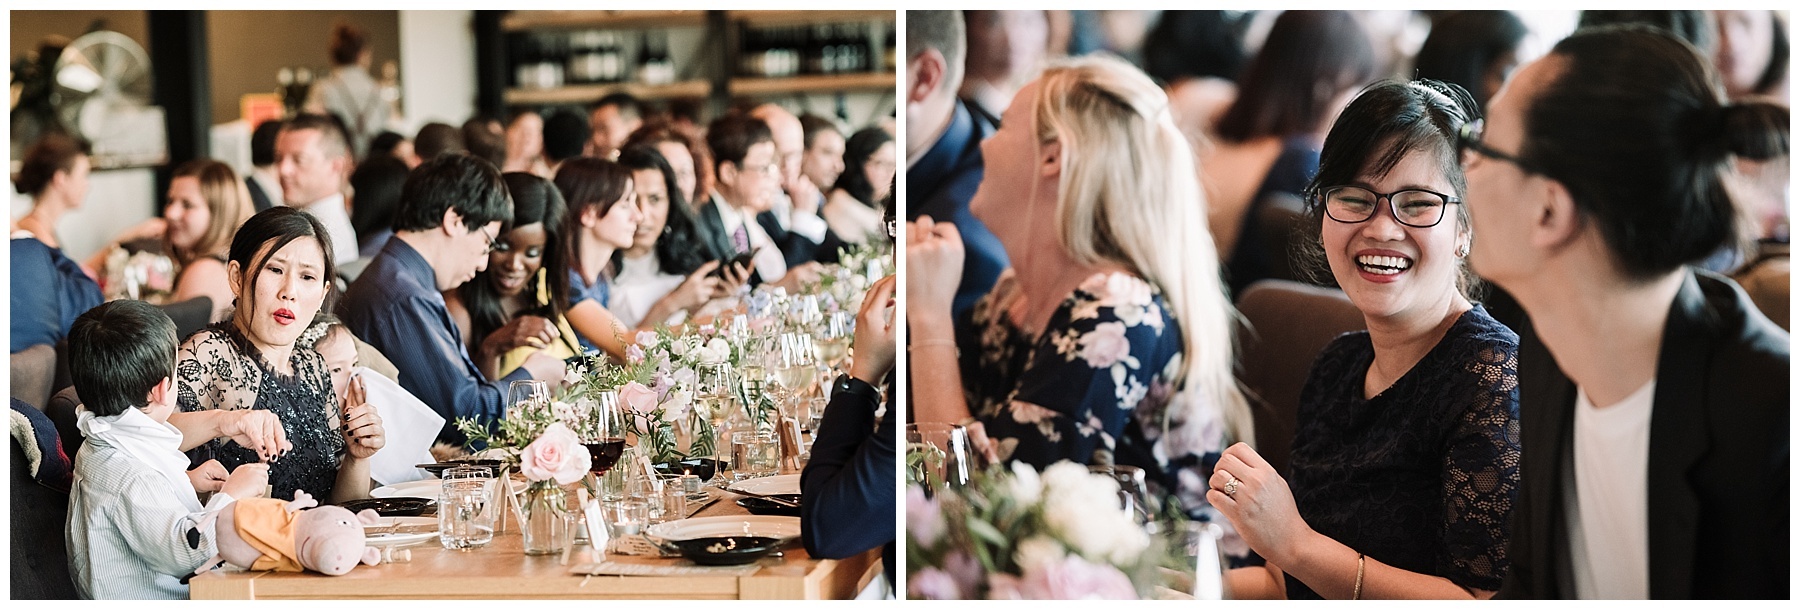 AUDREY WILKING COCKFIGHTERS GHOST Wedding Photographer_0083.jpg